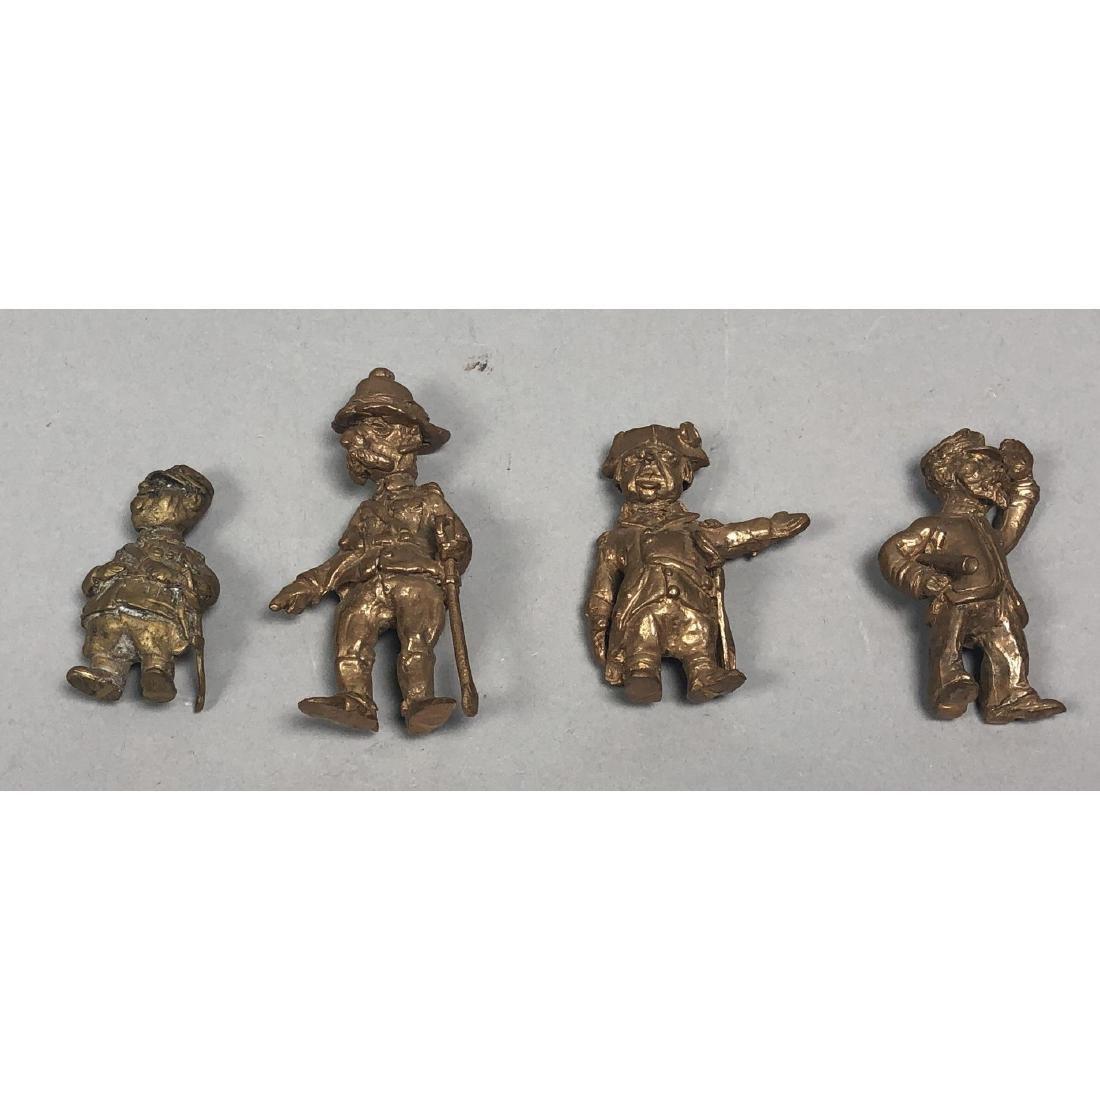 4pc STERLING LANIER Bronze Figures. Bronze milita